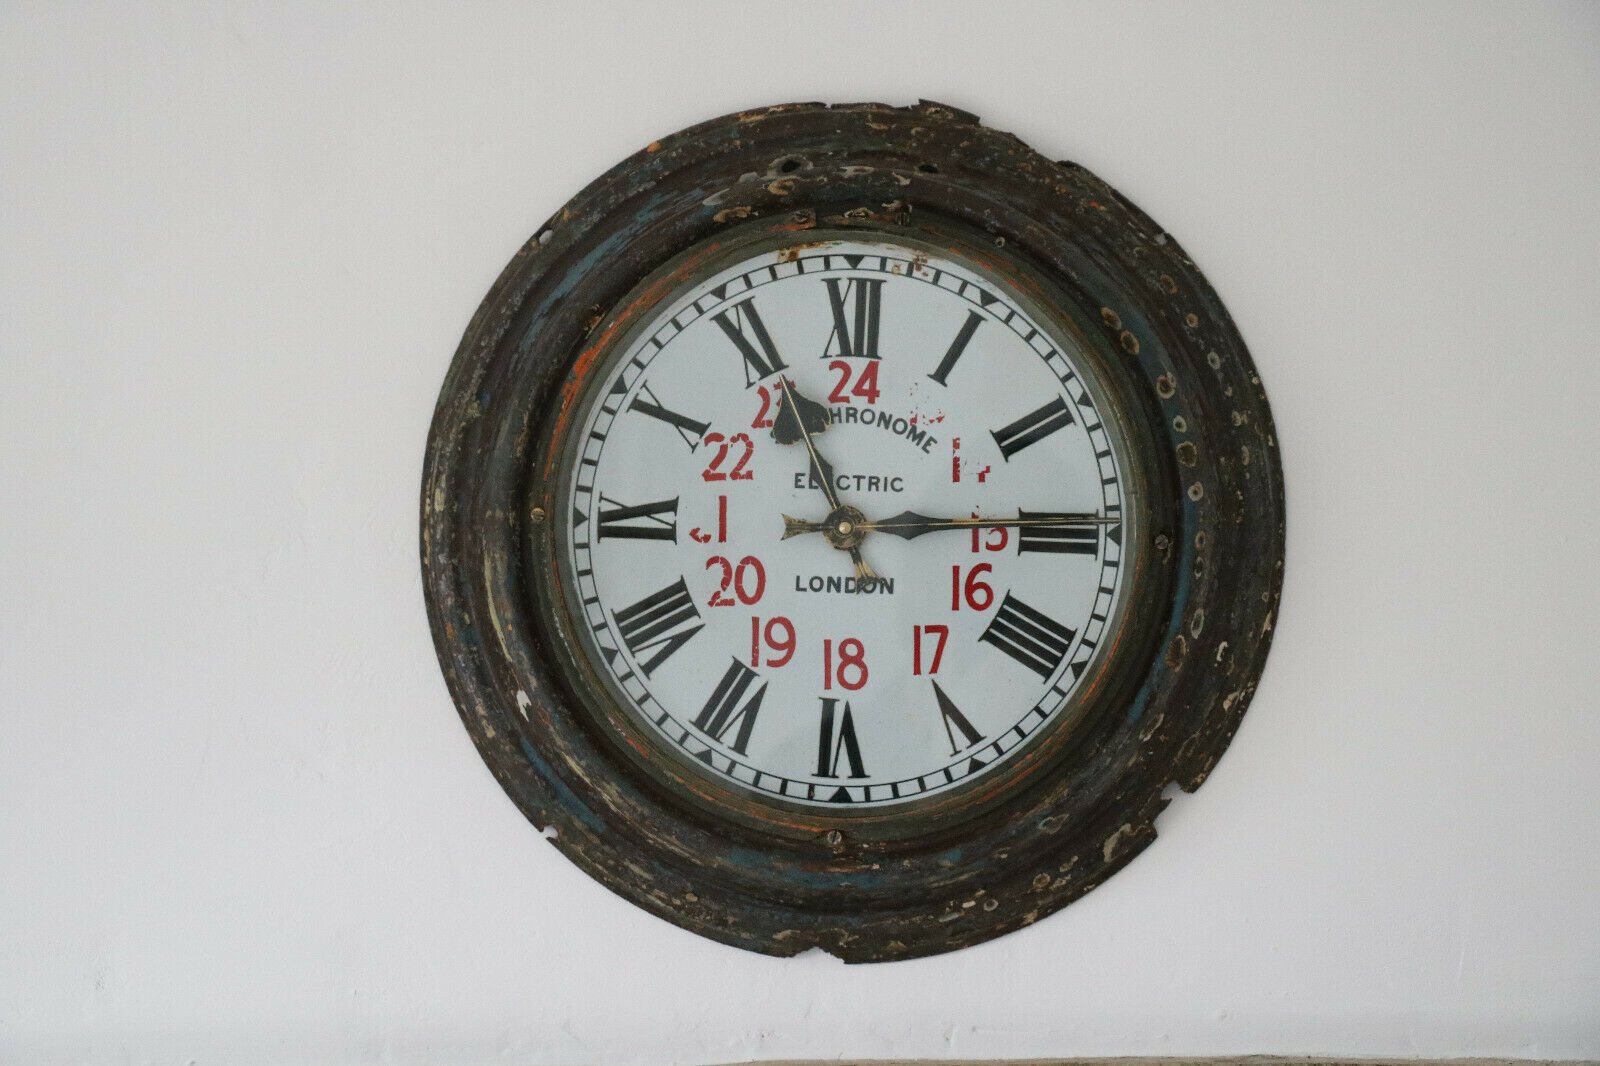 Antique Railway Clock Vintage